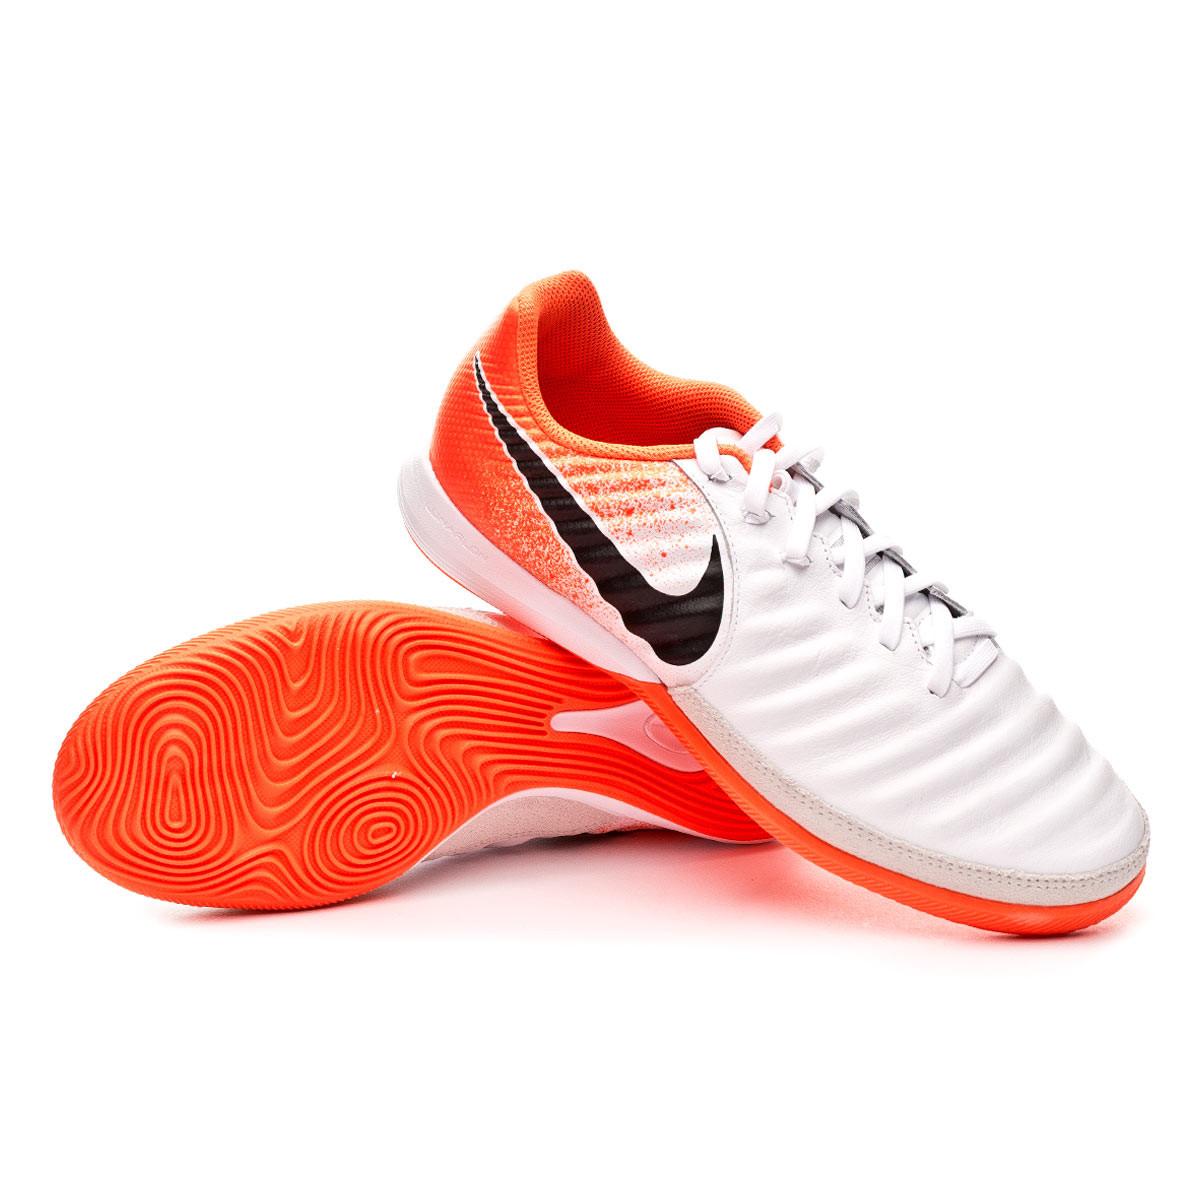 Chaussure de futsal Nike Tiempo LegendX VII Pro IC